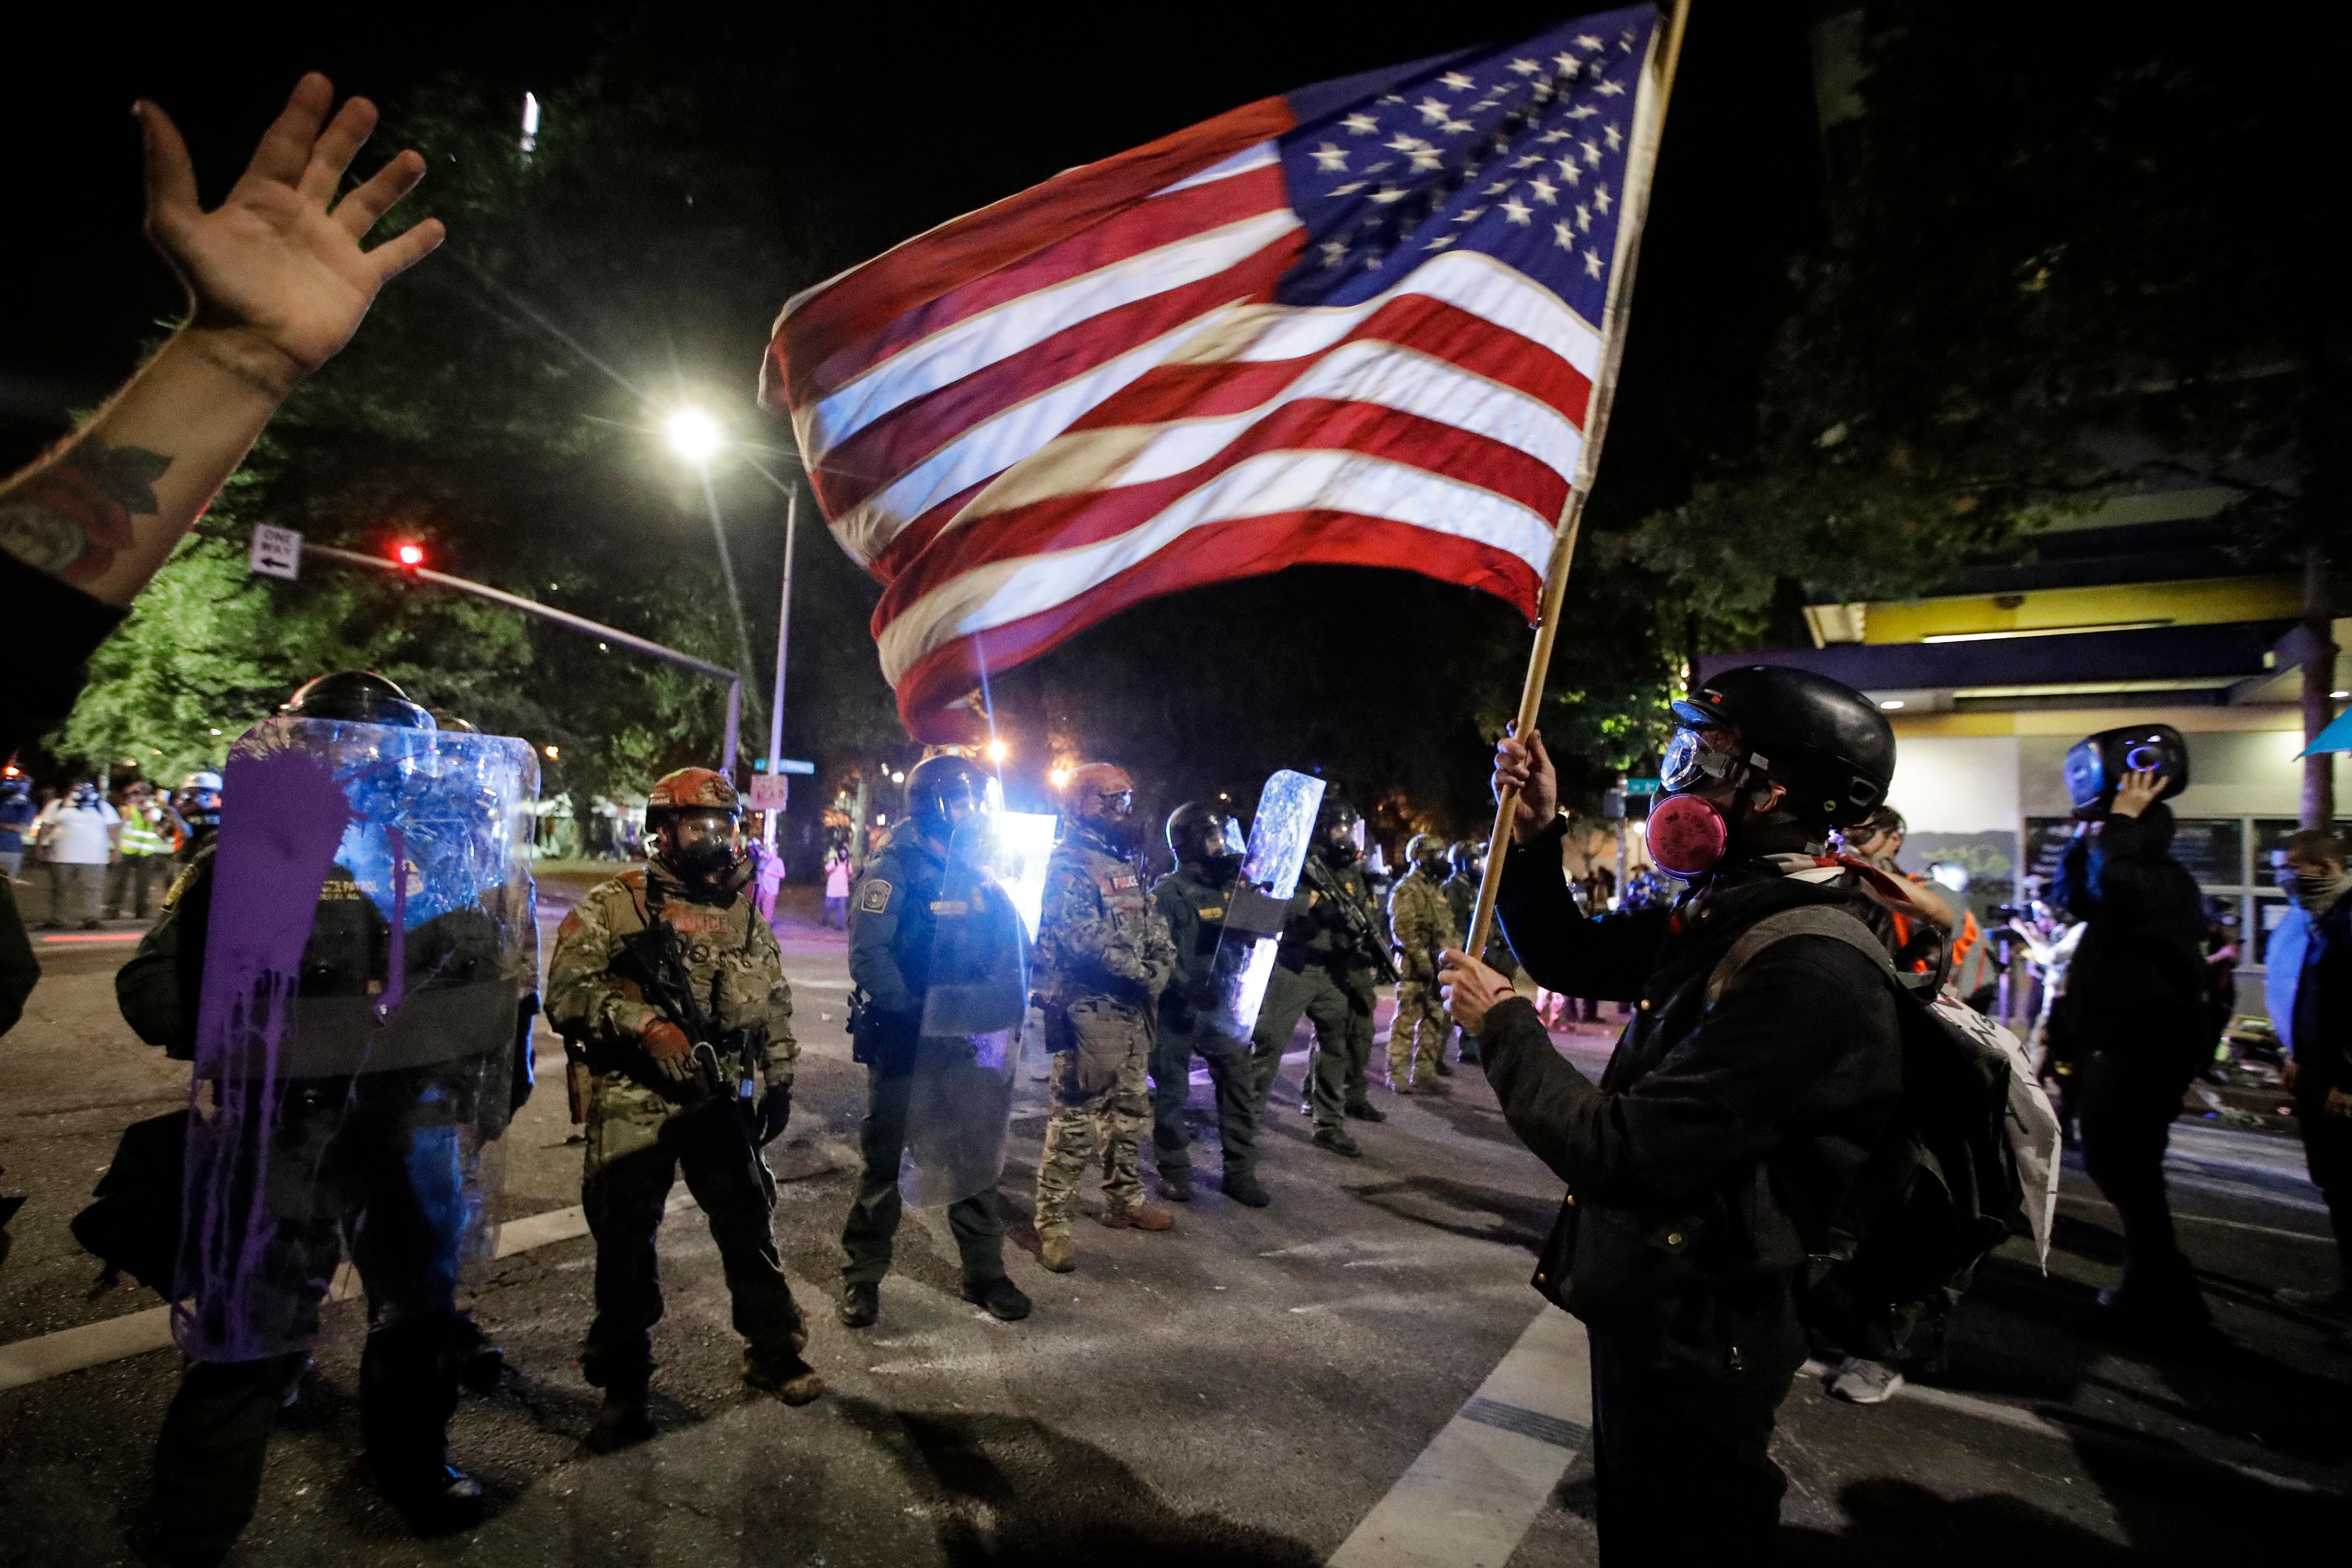 Около 140 силовиков пострадали во время протестов в Портленде